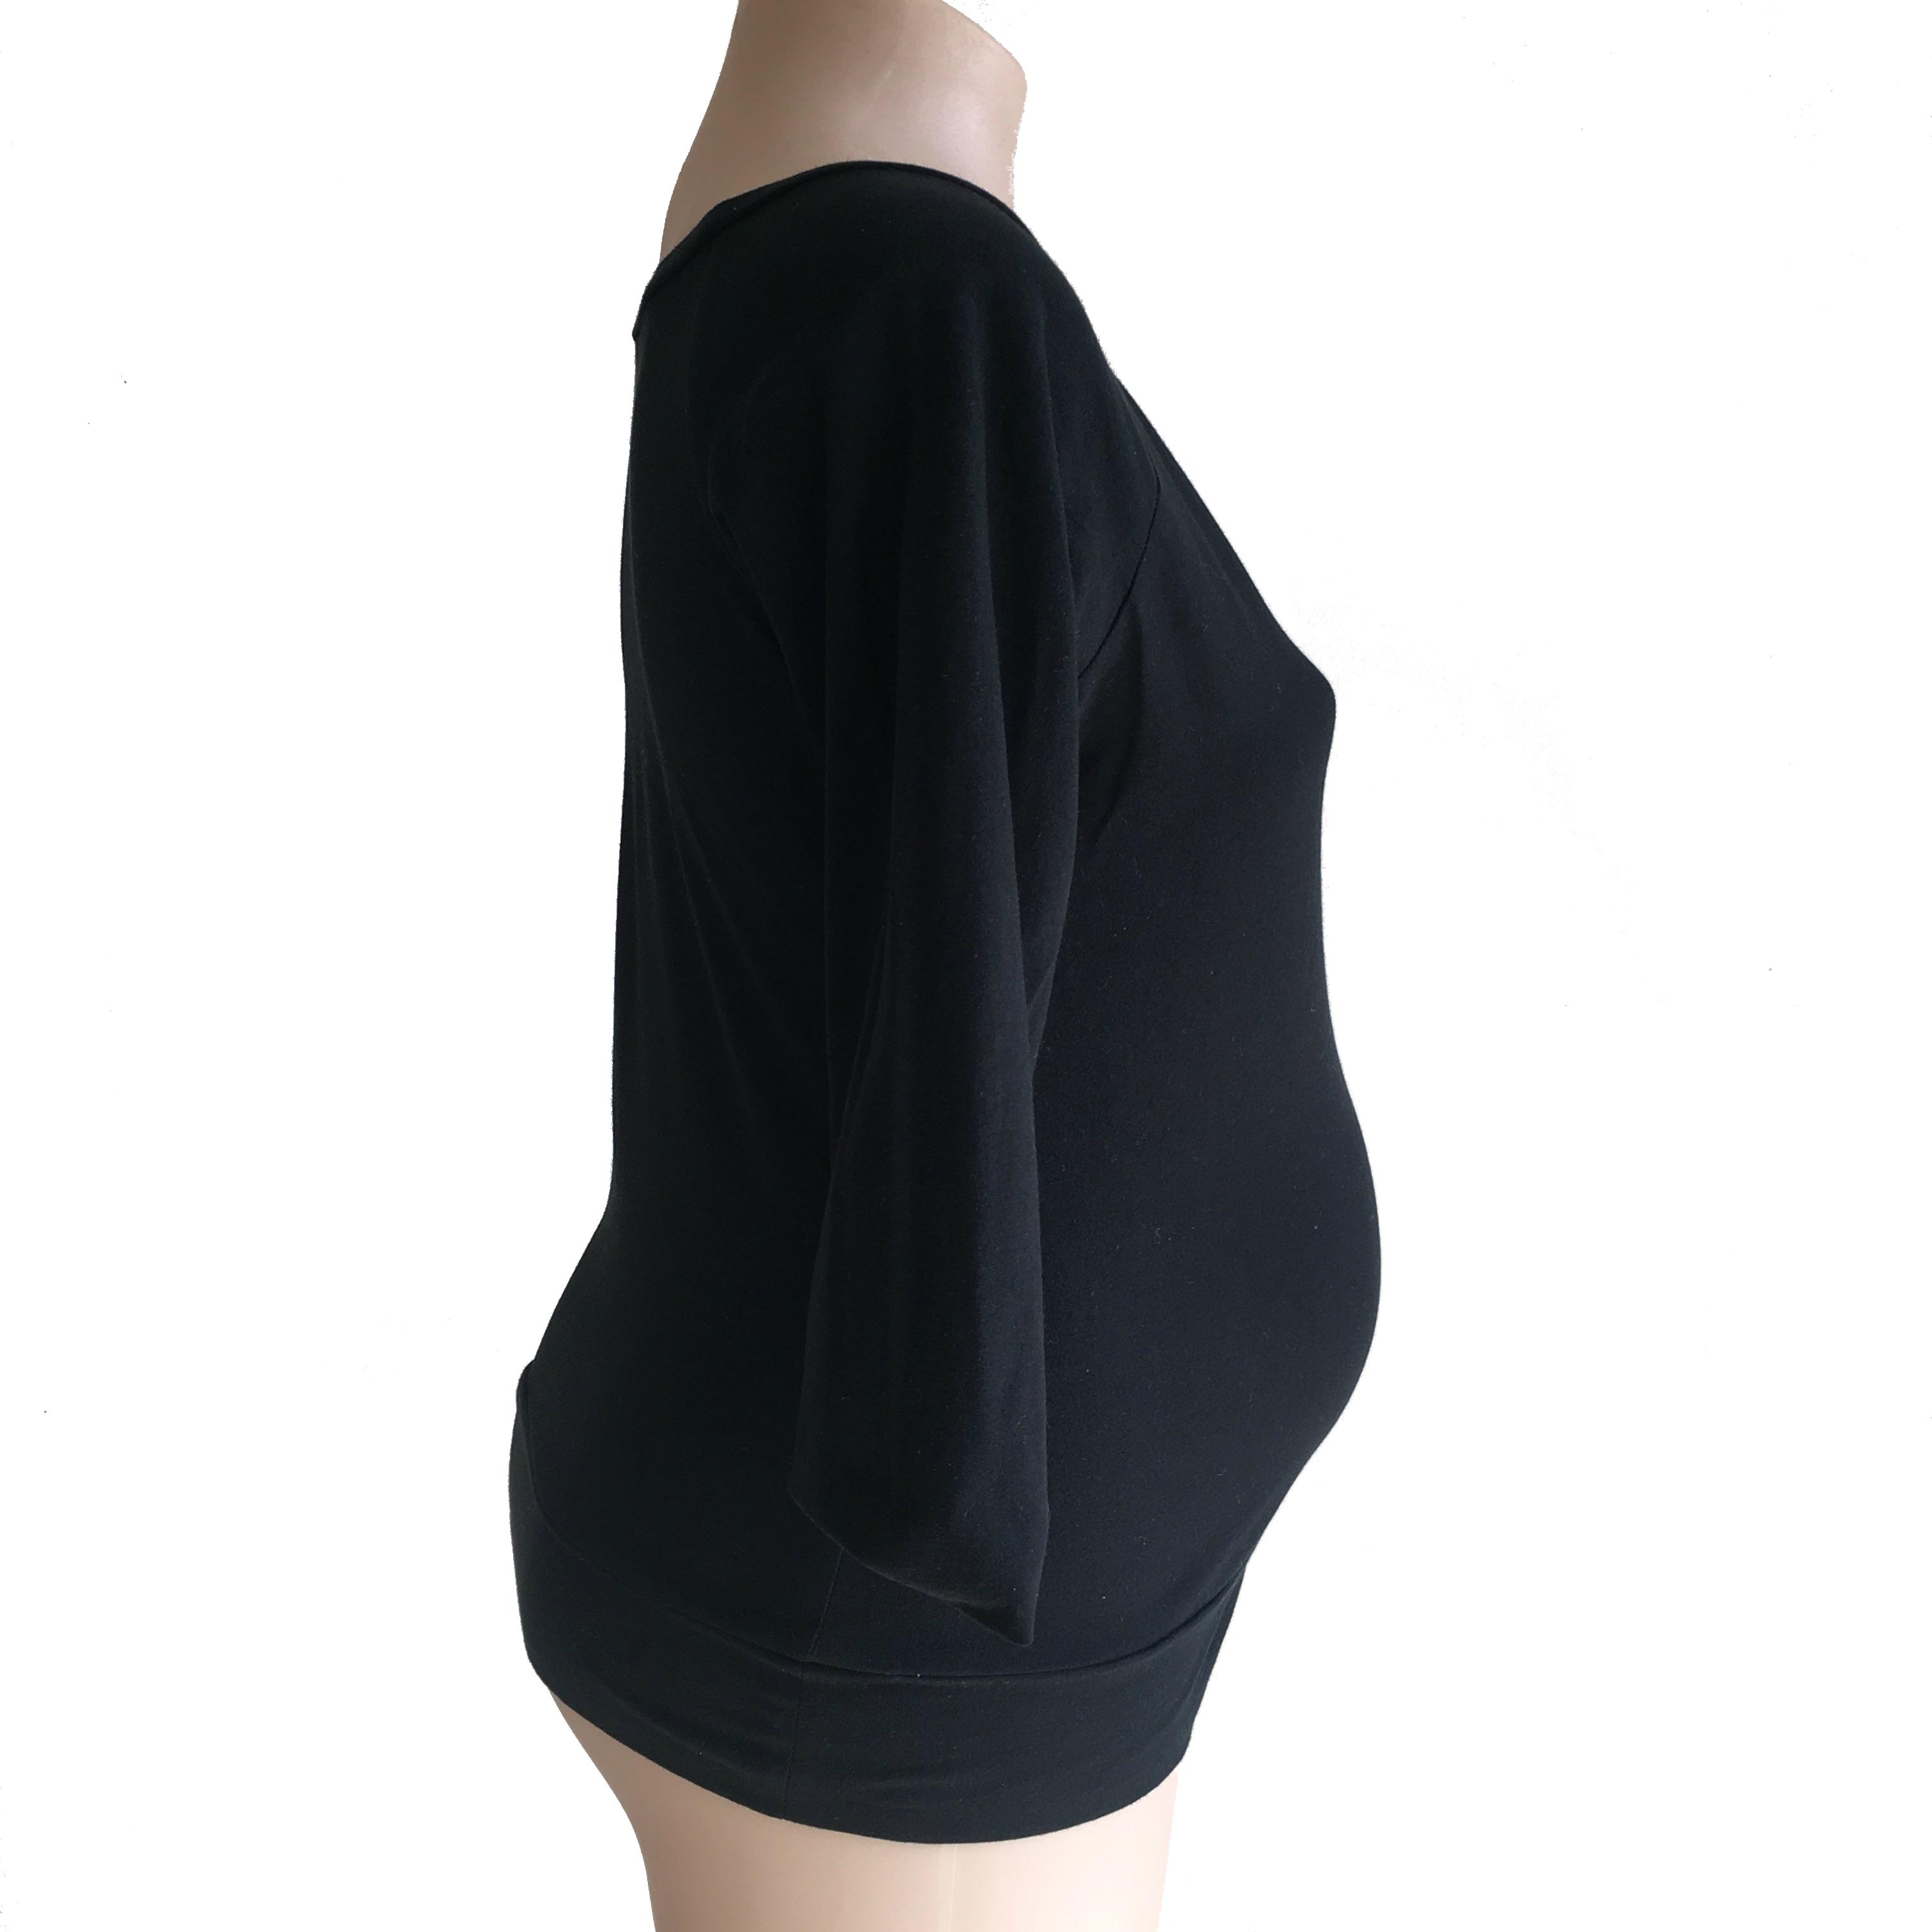 Raglan Maternity Top in Black